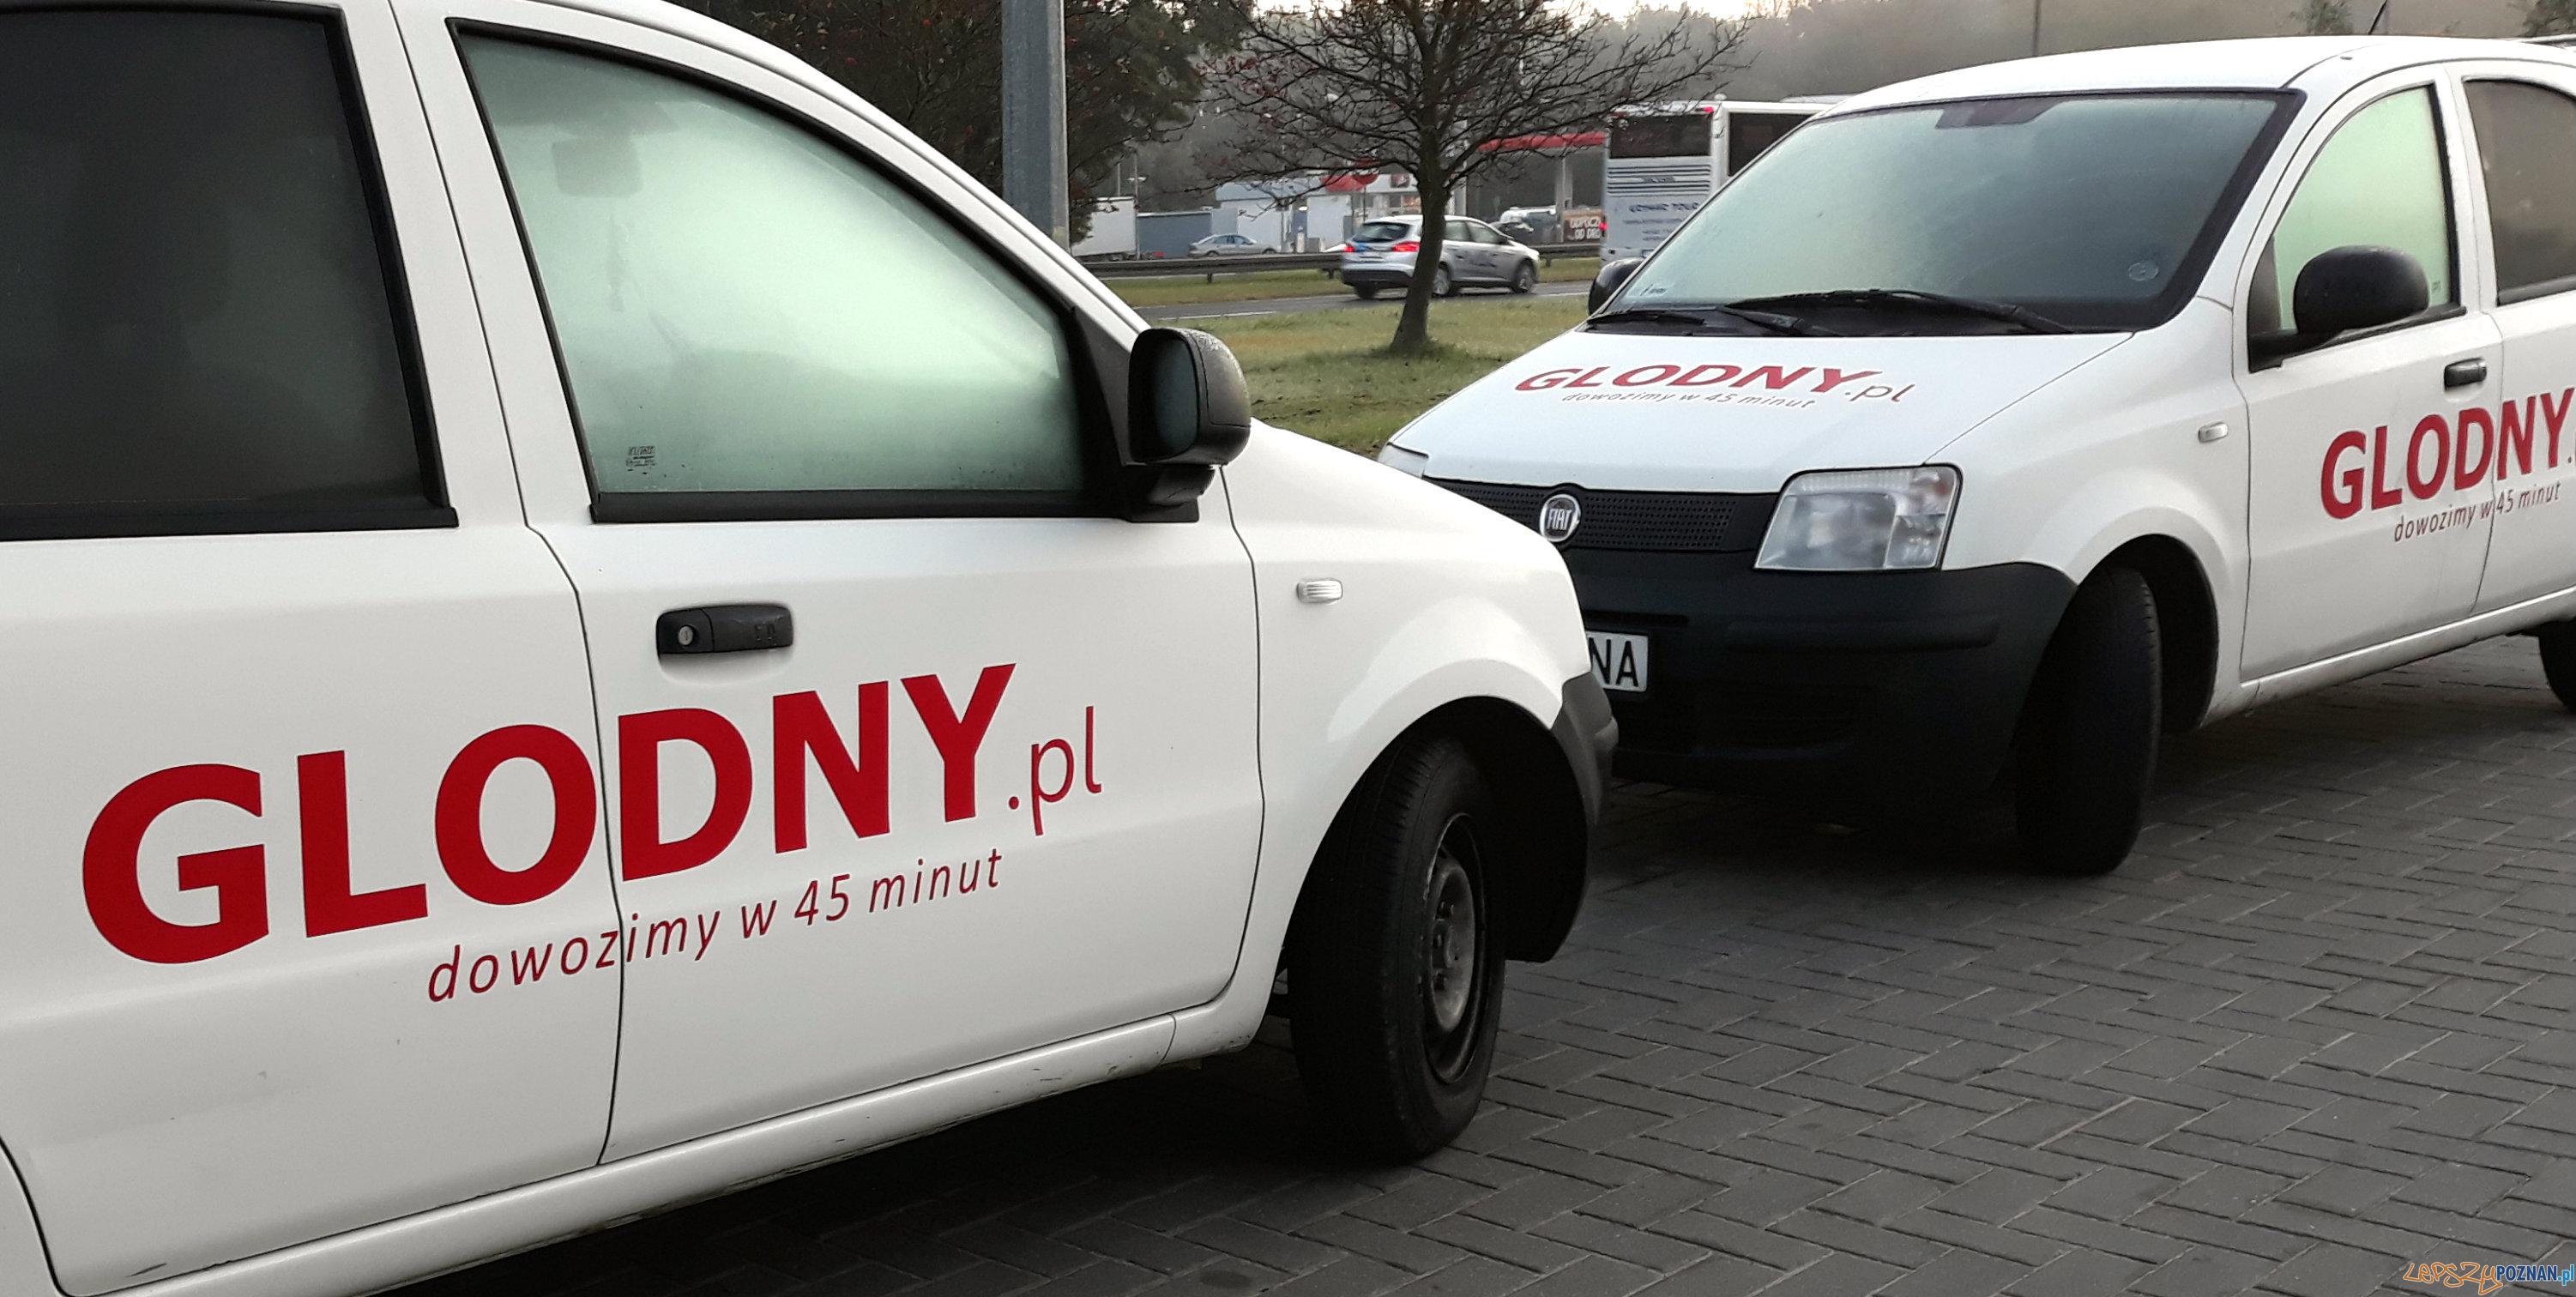 samochody Glodny.pl  Foto: lepszyPOZNAN.pl / gsm